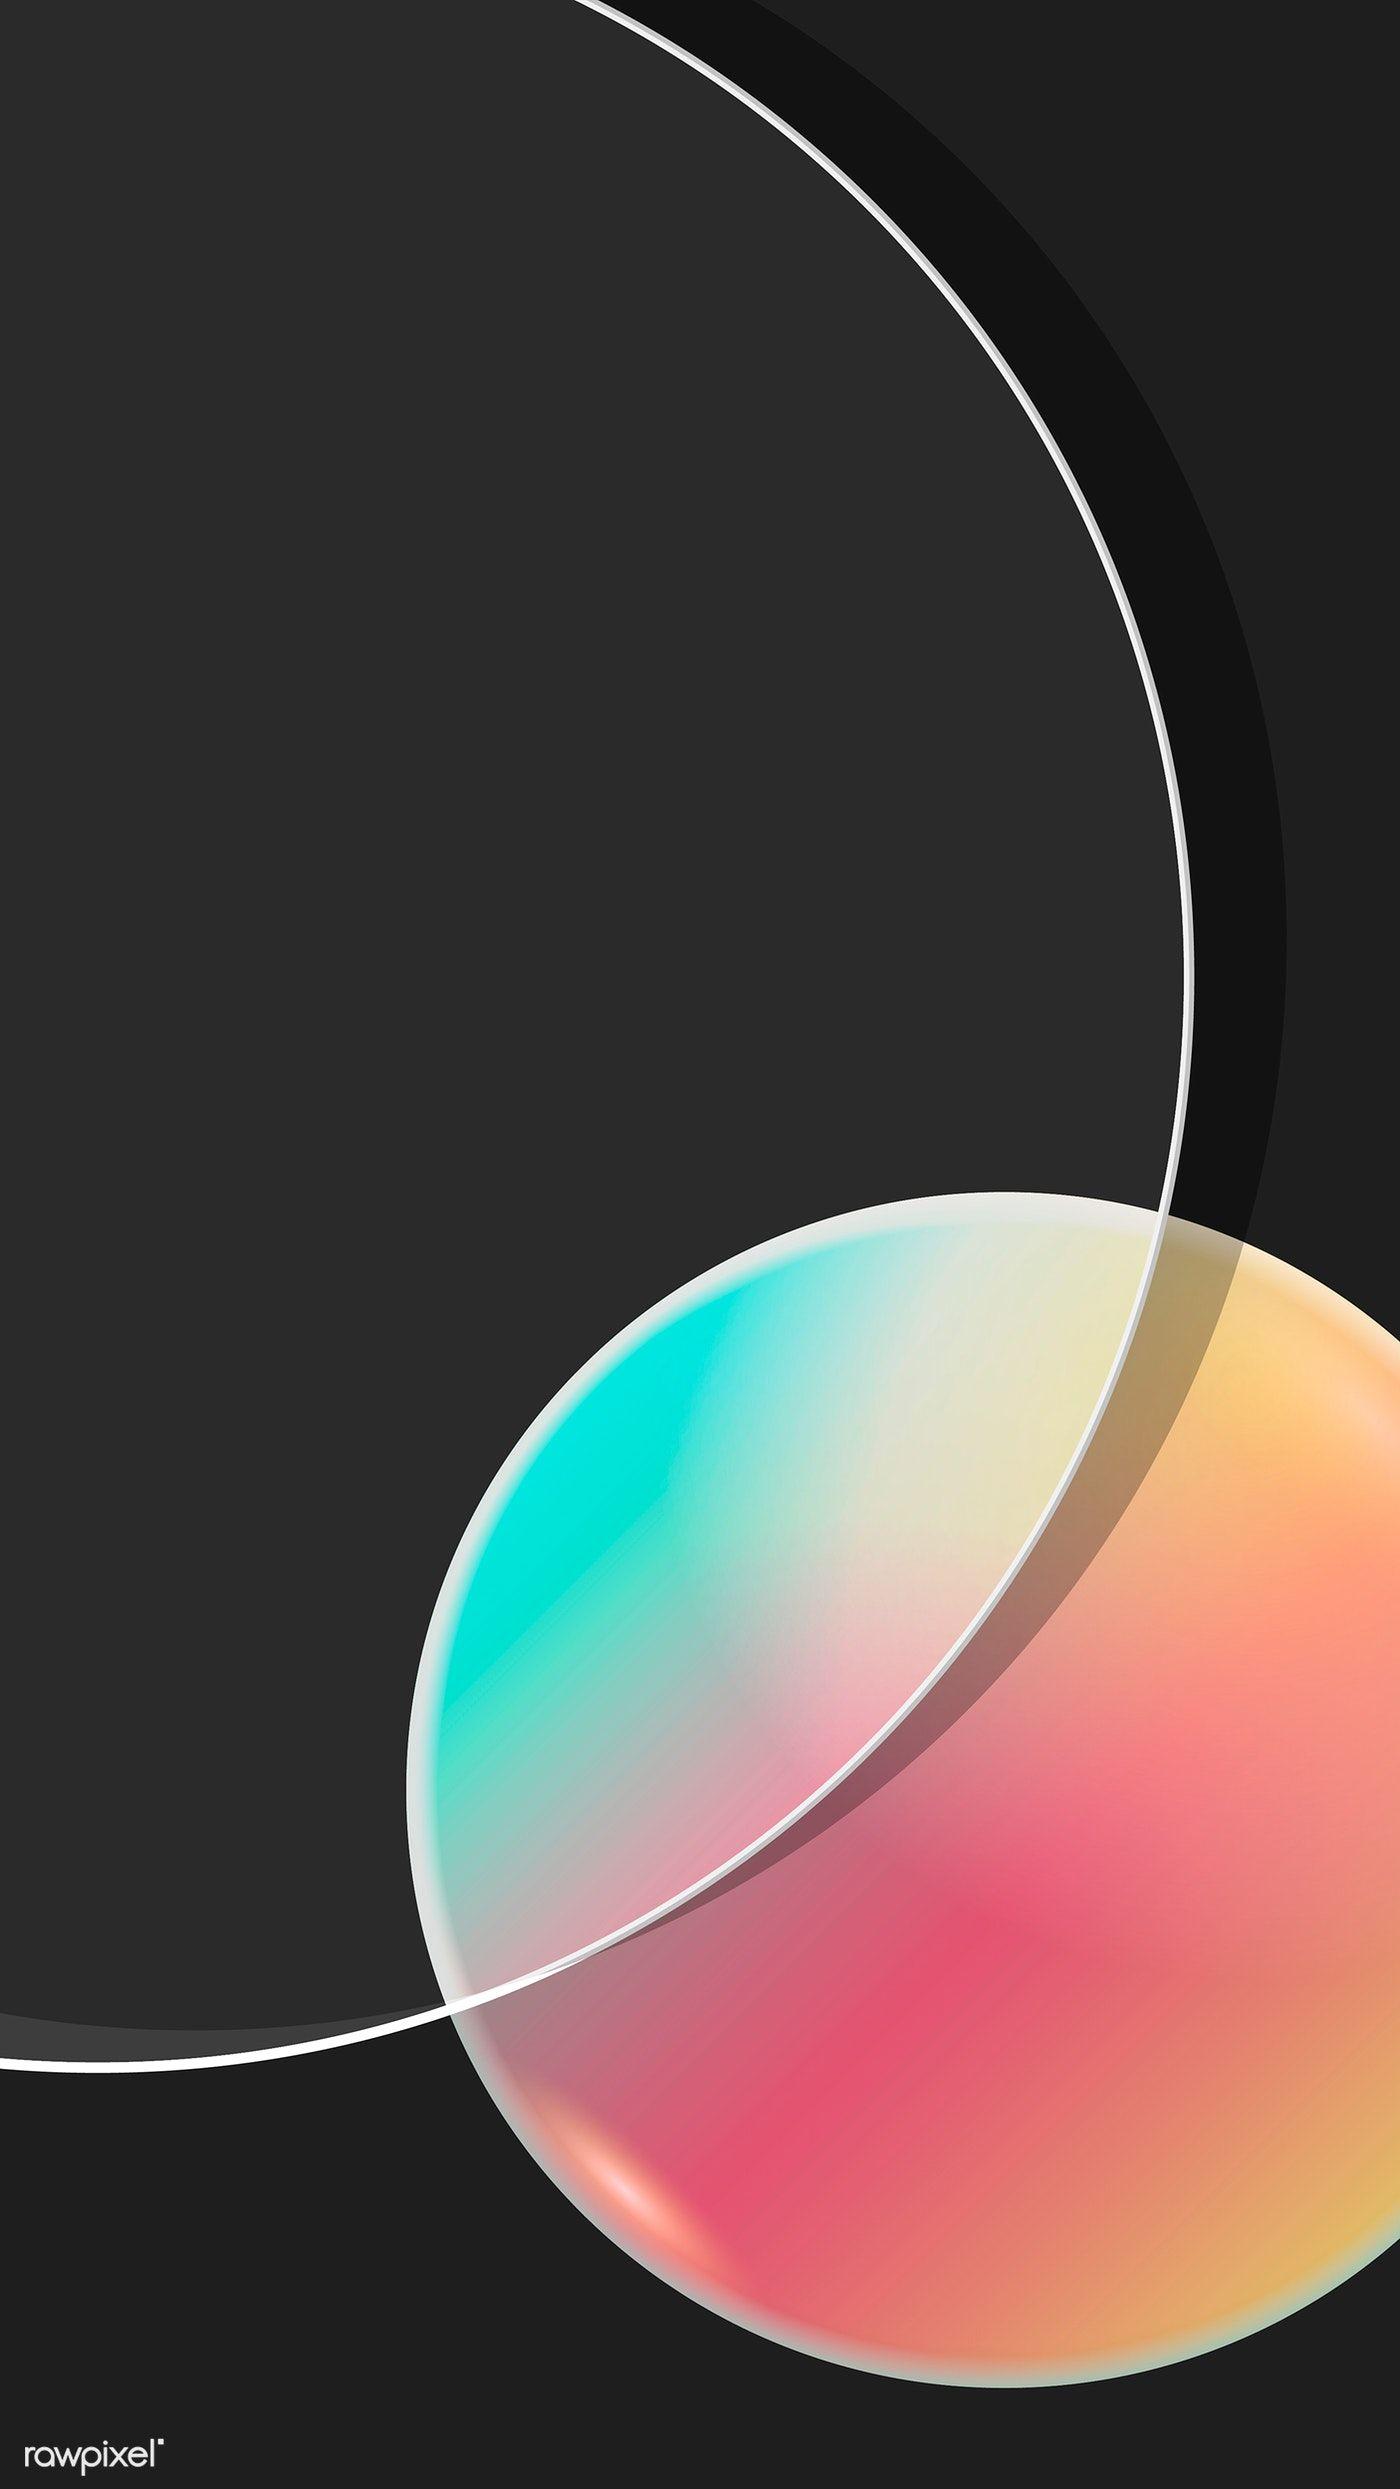 Download premium vector of Colorful round geometric mobile phone wallpaper